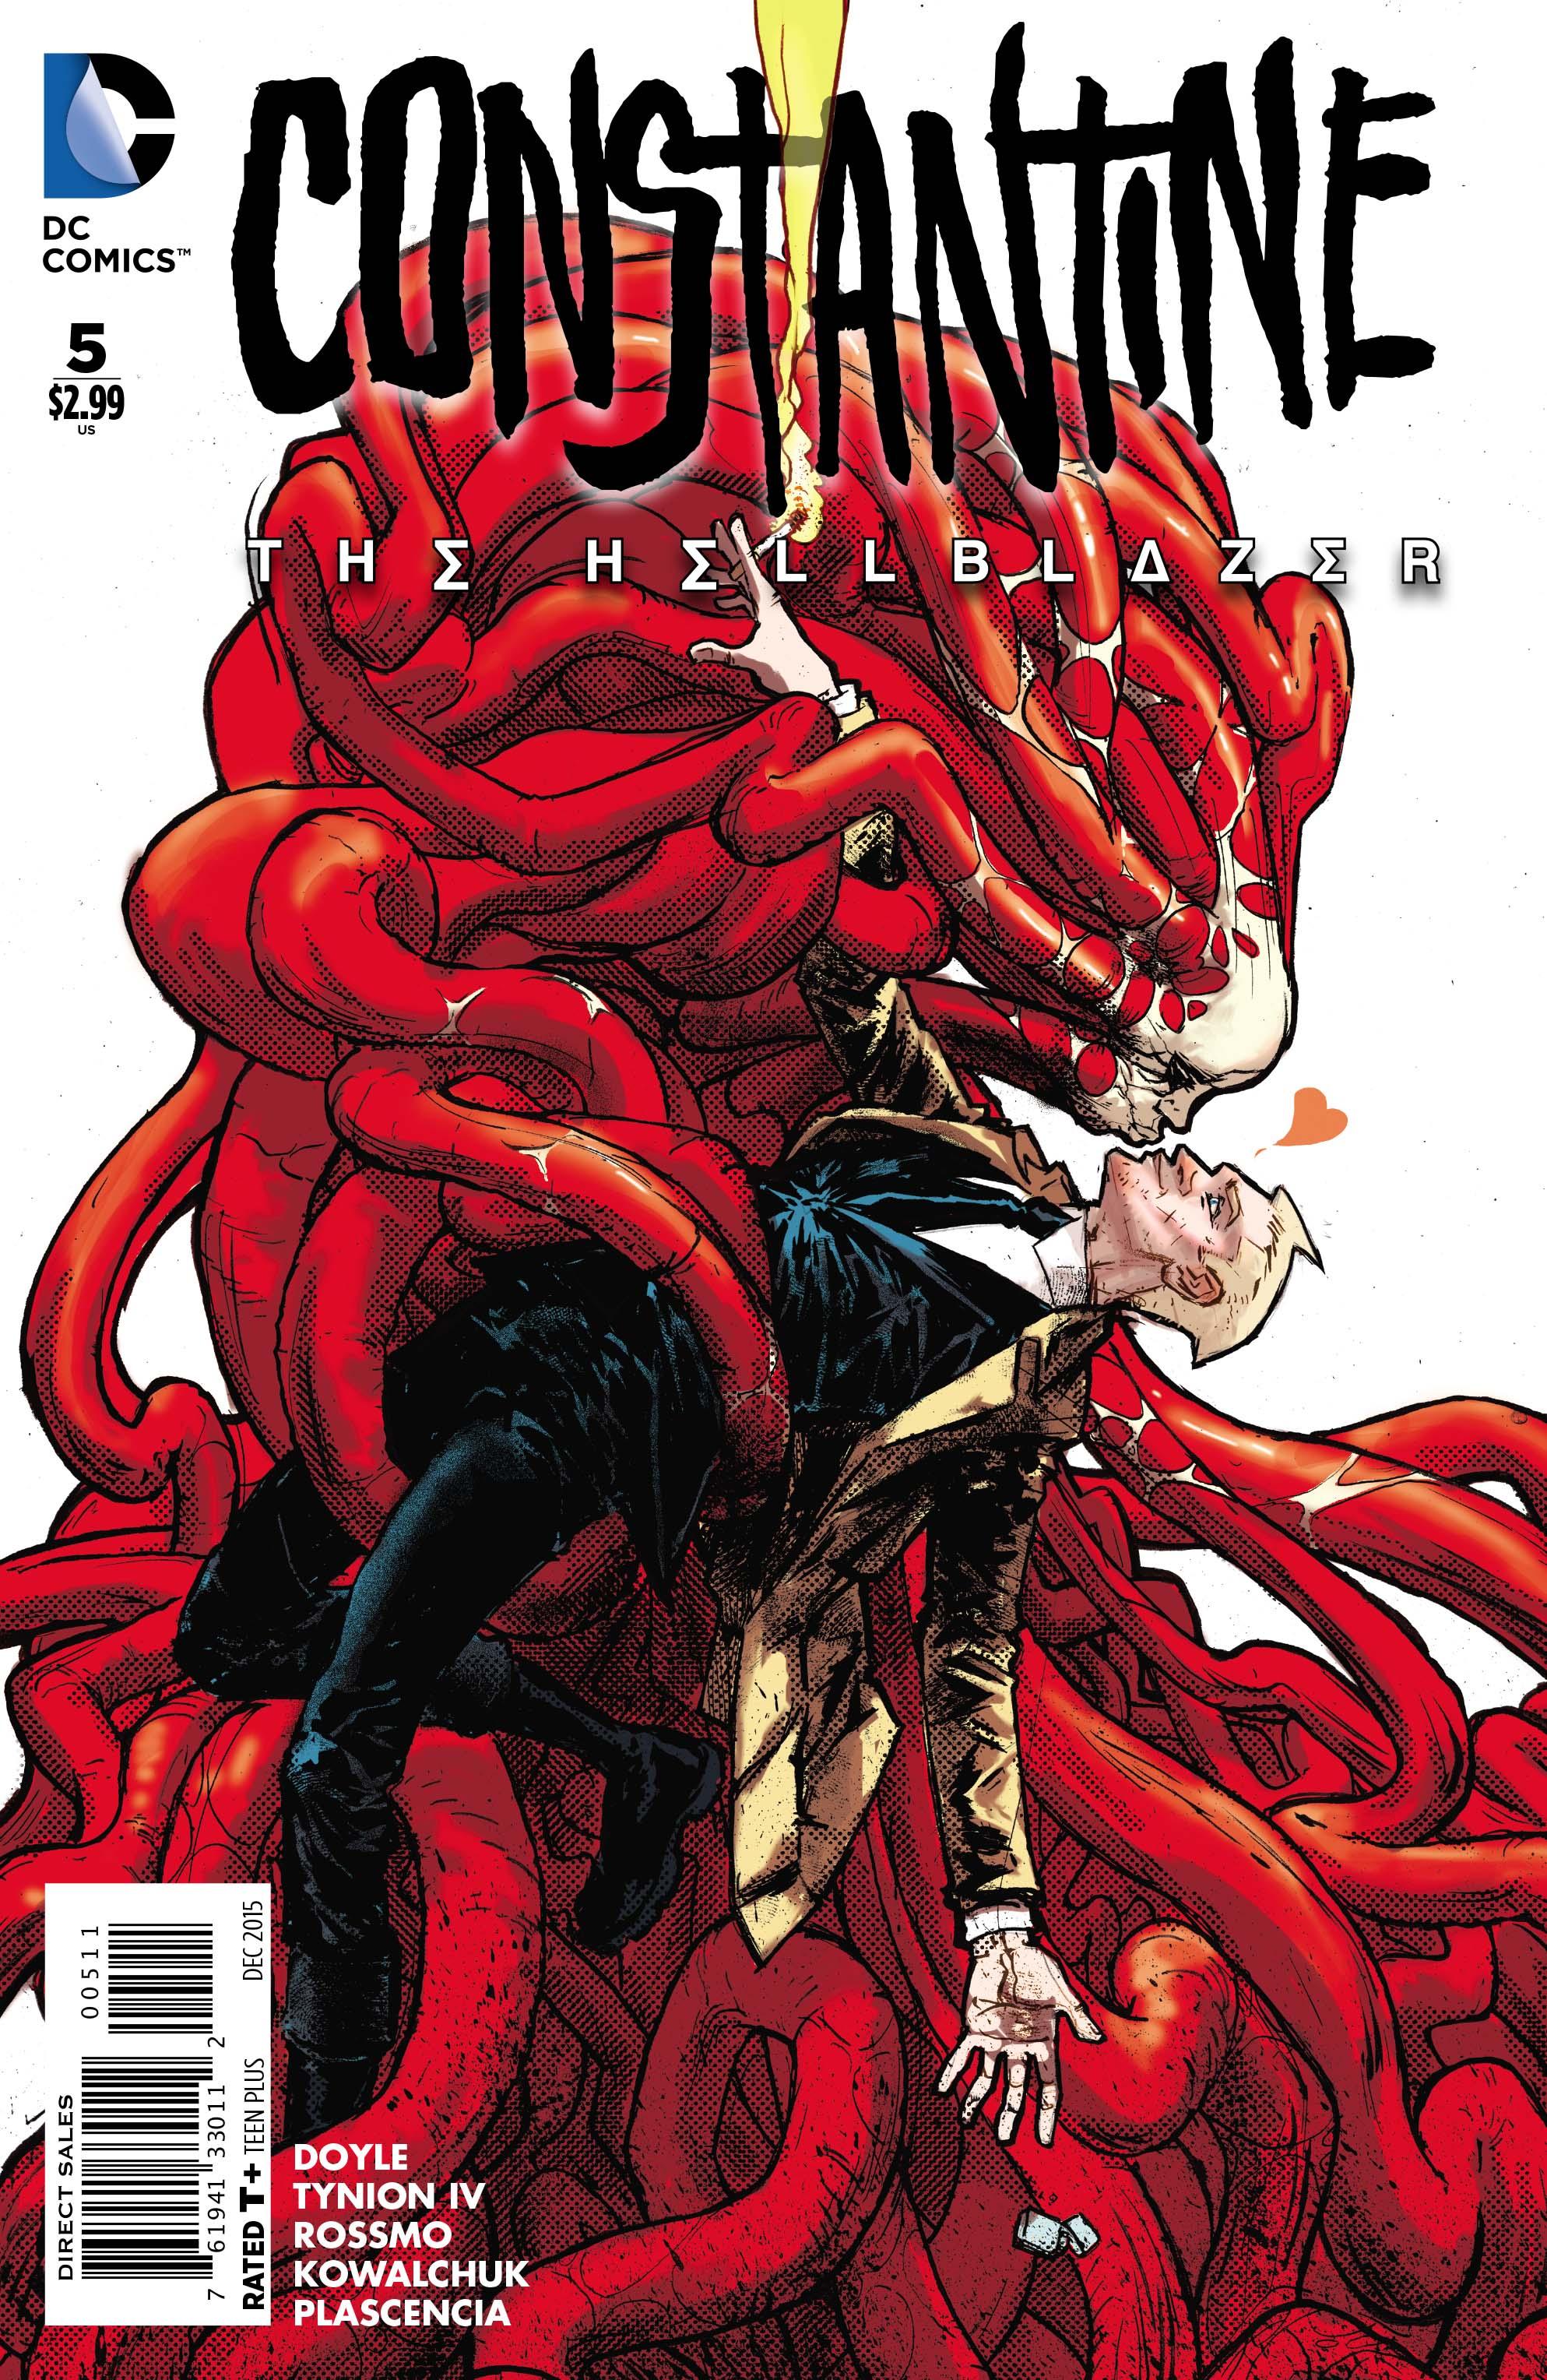 Constantine The Hellblazer Issue 5 John Constantine